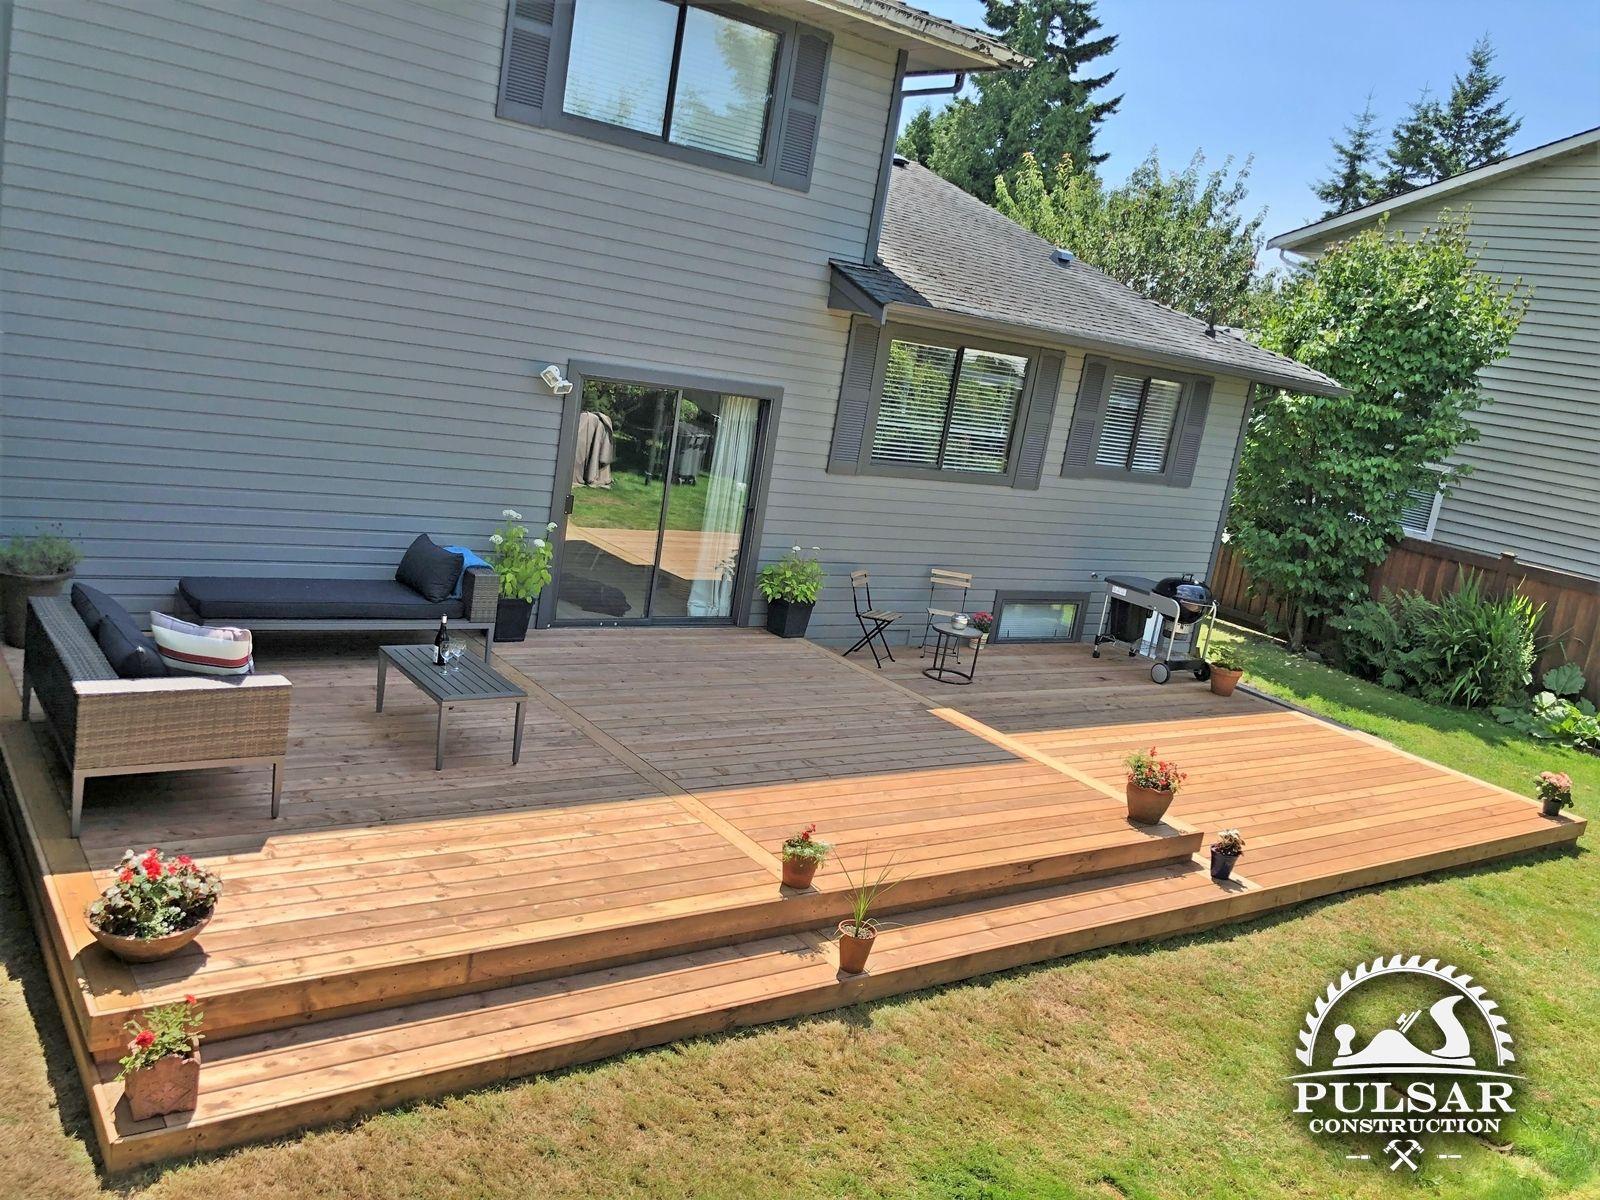 Split Level Patio Deck Deck Designs Backyard Patio Plans Diy Backyard Patio Split level house backyard ideas